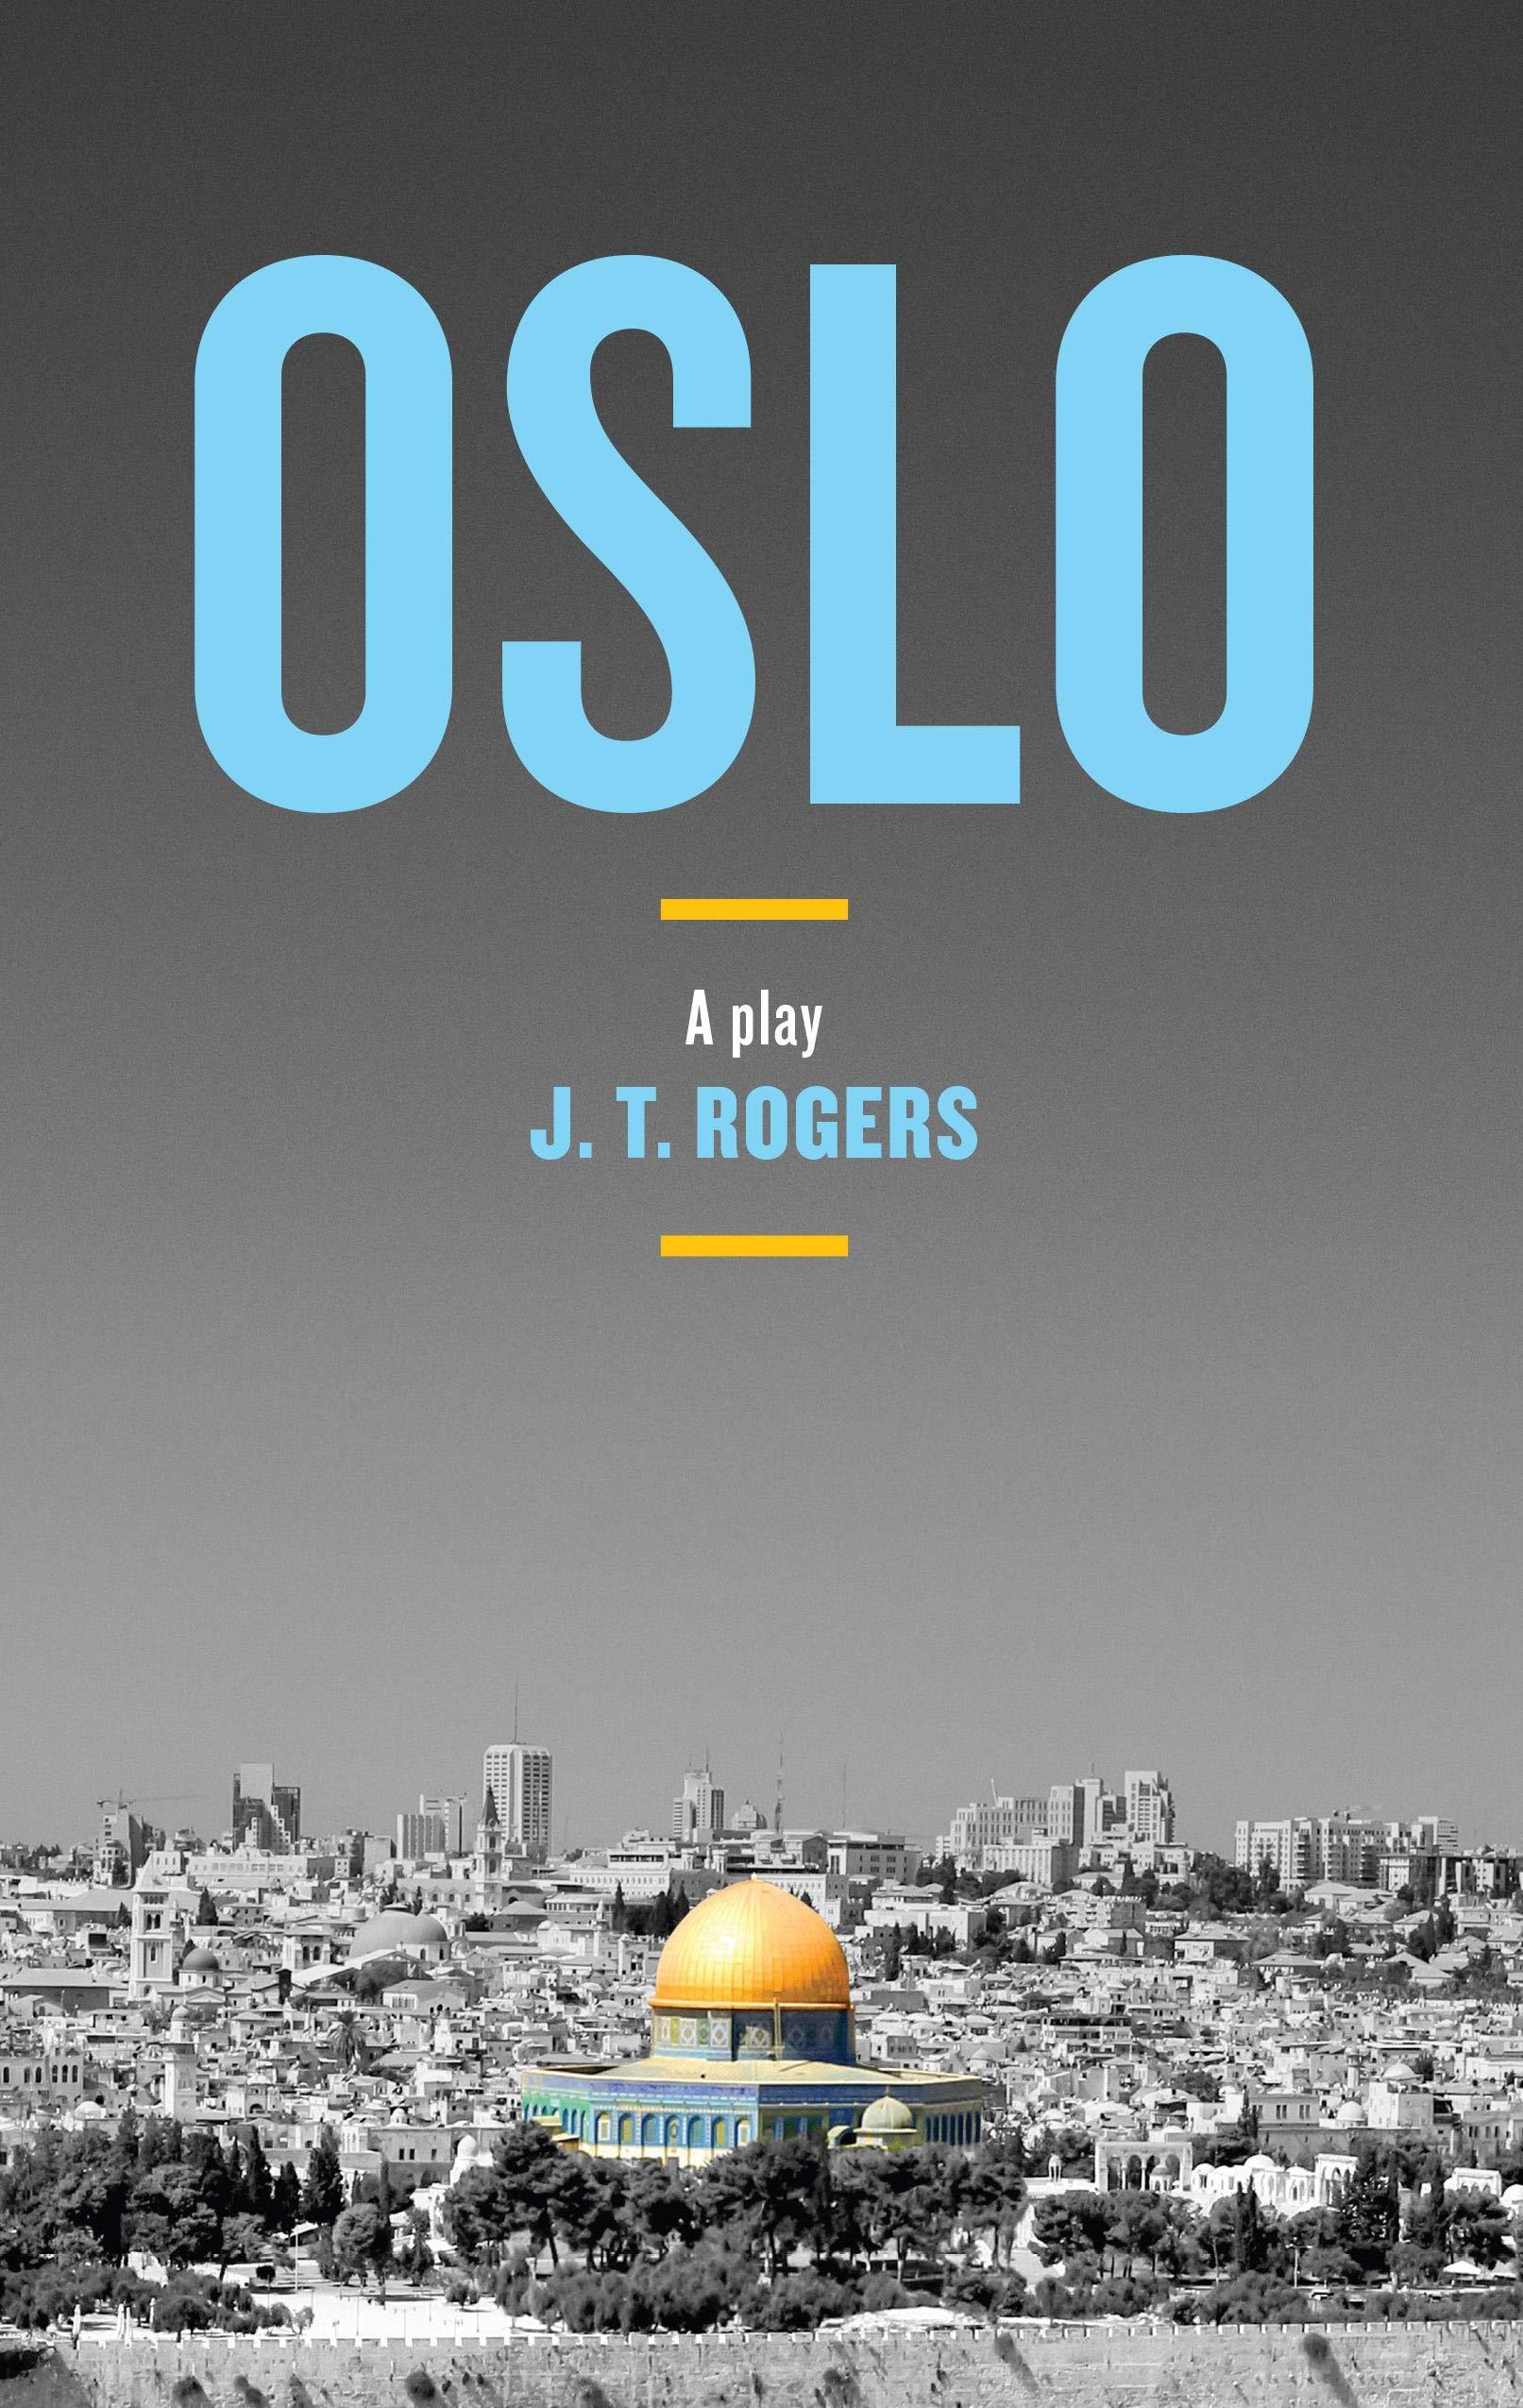 Oslo  J.T. Rogers  9781559365567  Amazon.com  Books b8816dc1facc